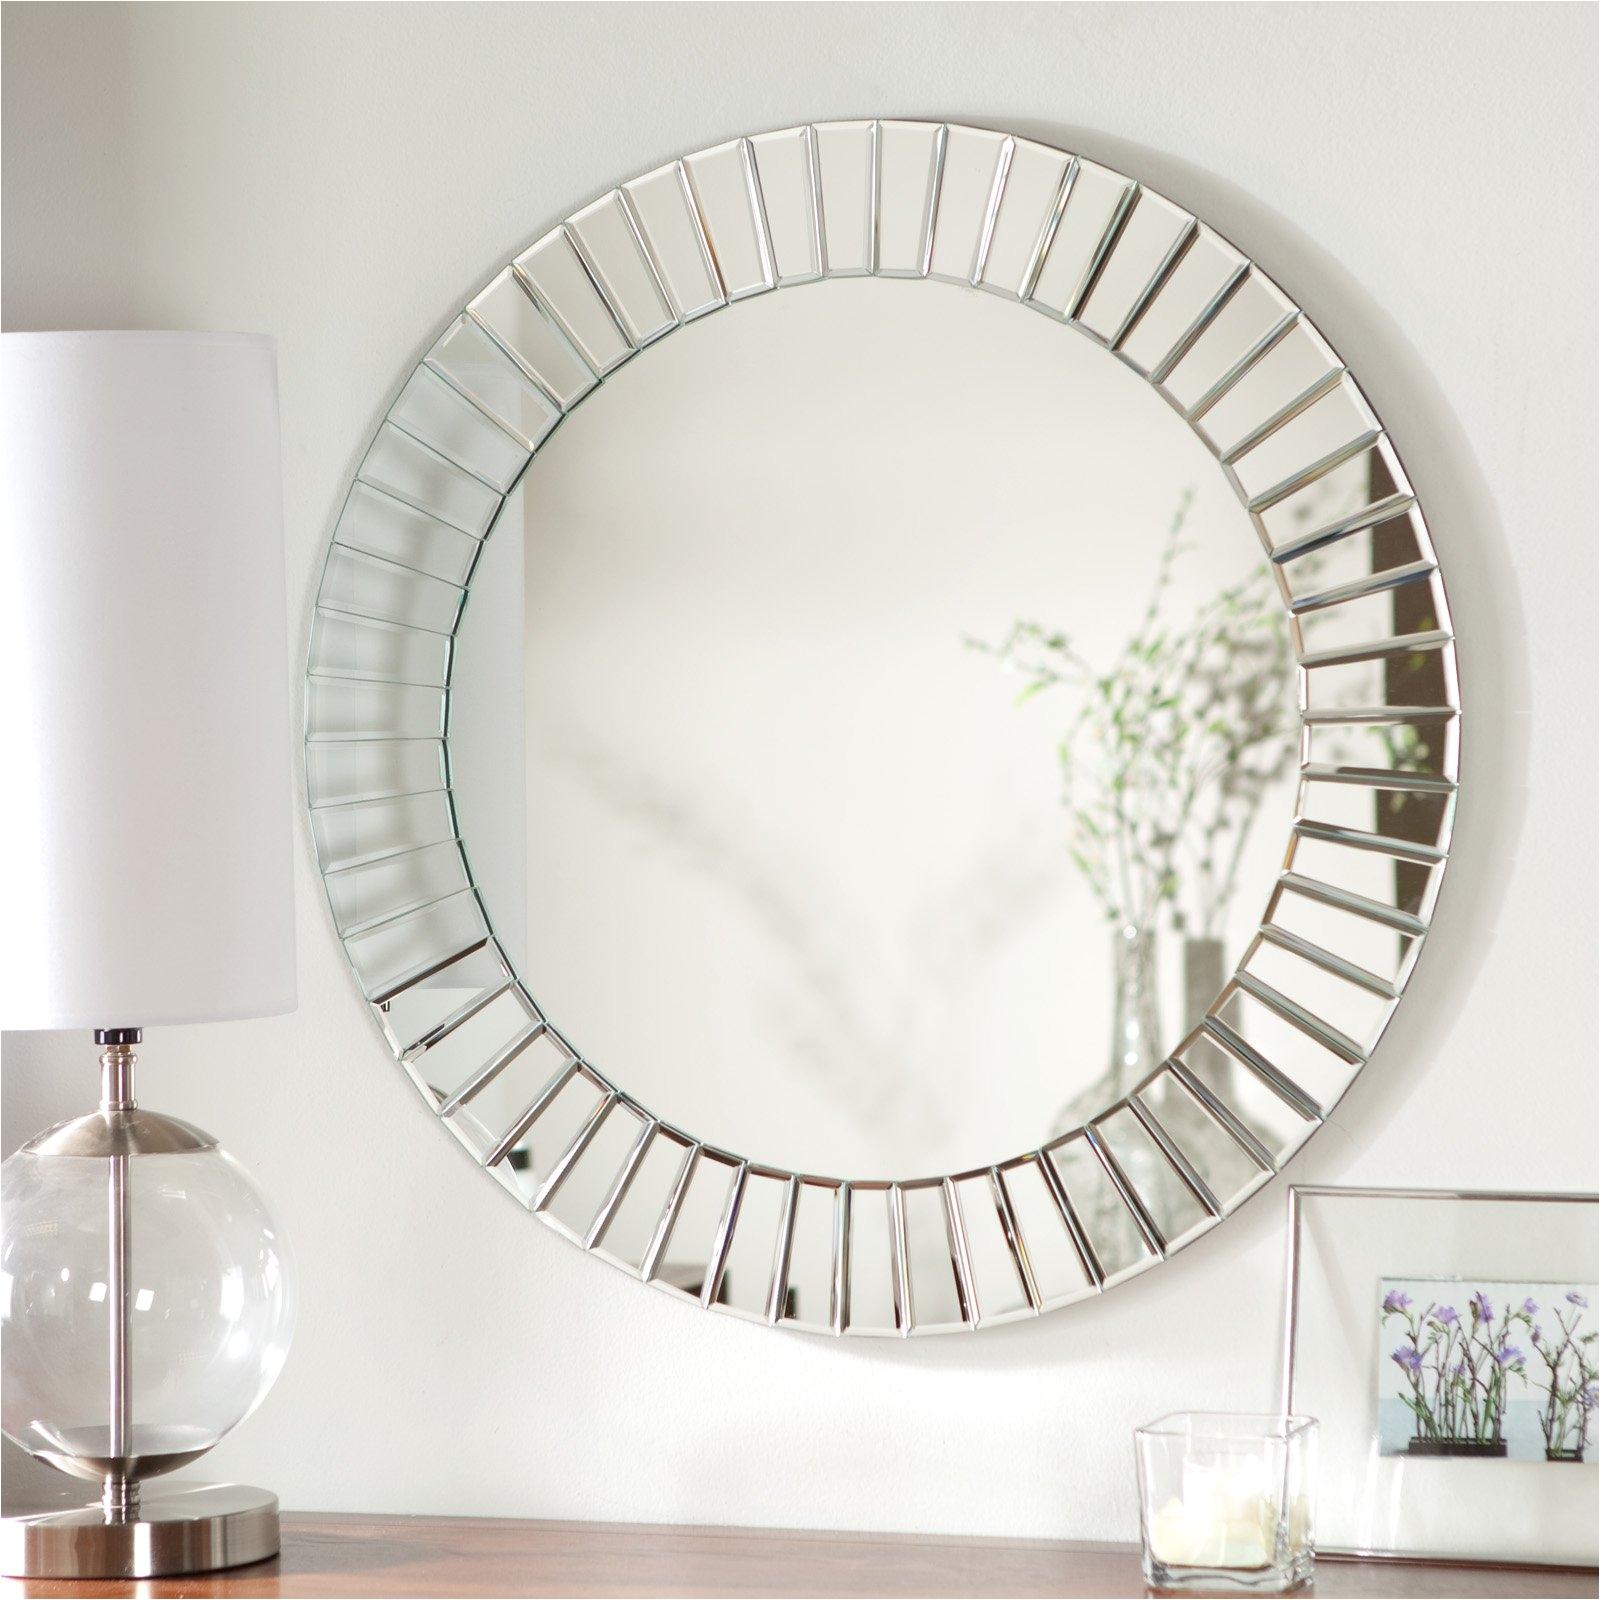 12 photos gallery of ideas frameless beveled mirror